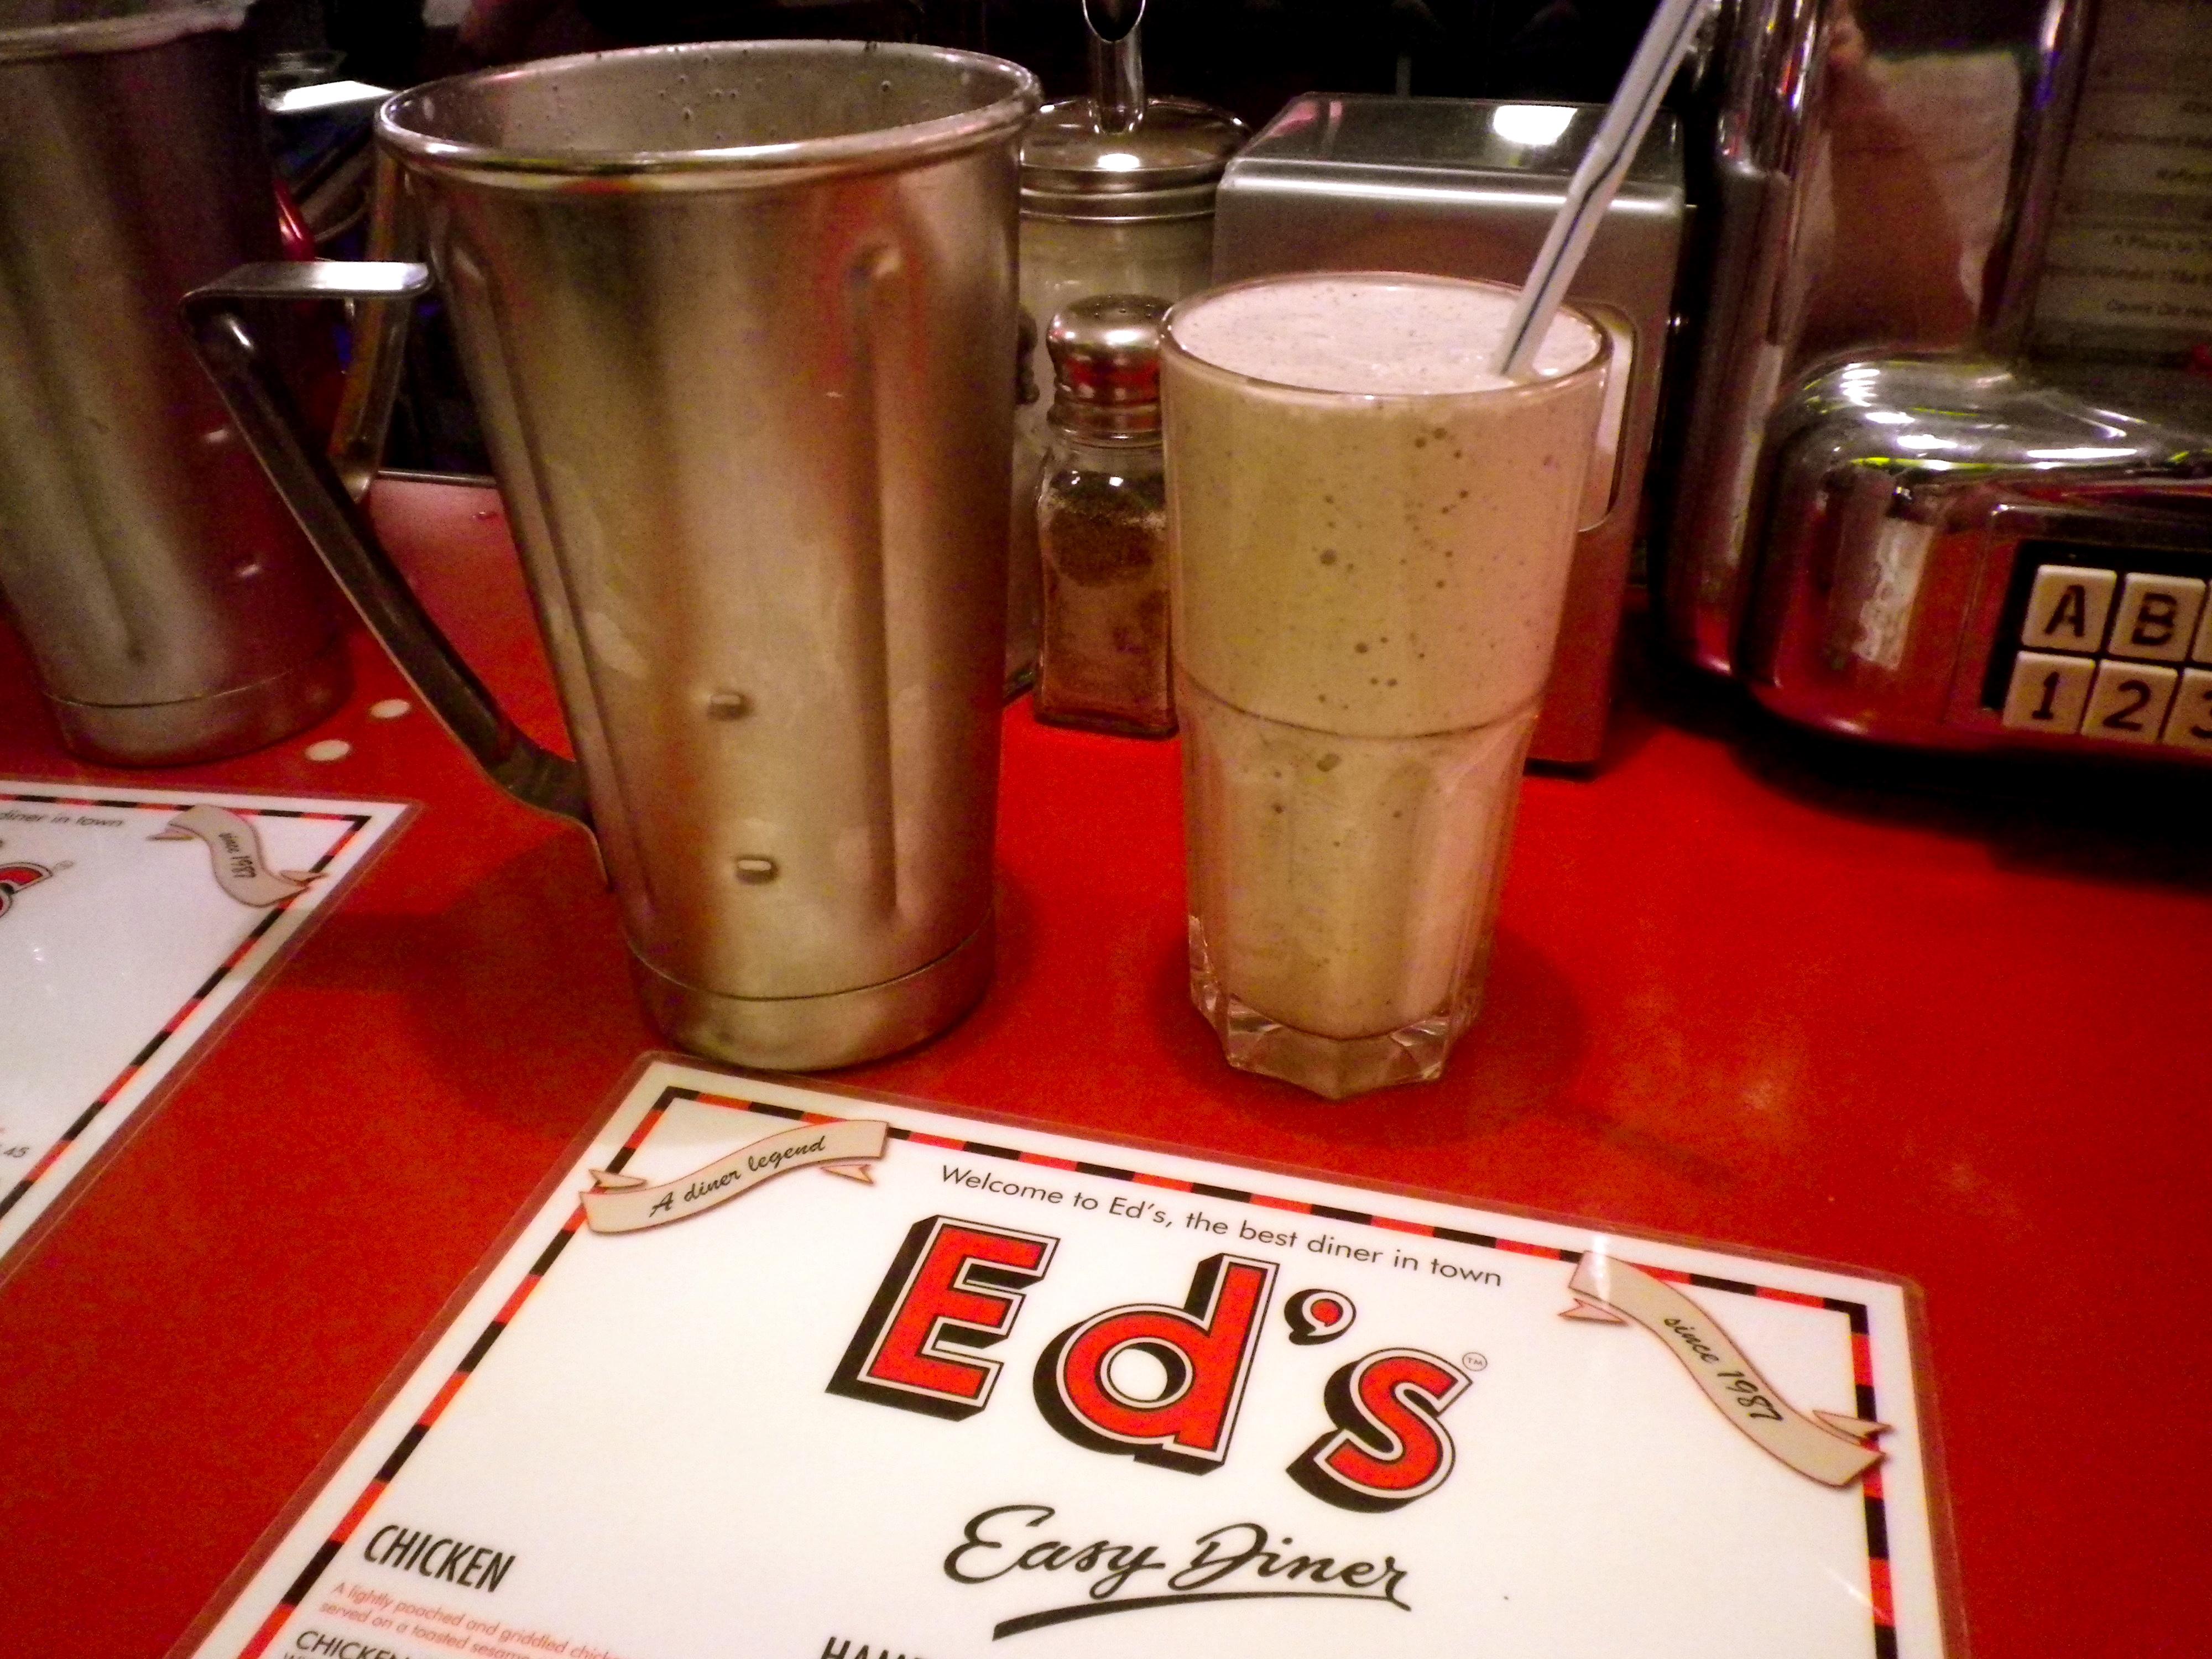 Ed S Diner Soho Thoroughly Modern Milly